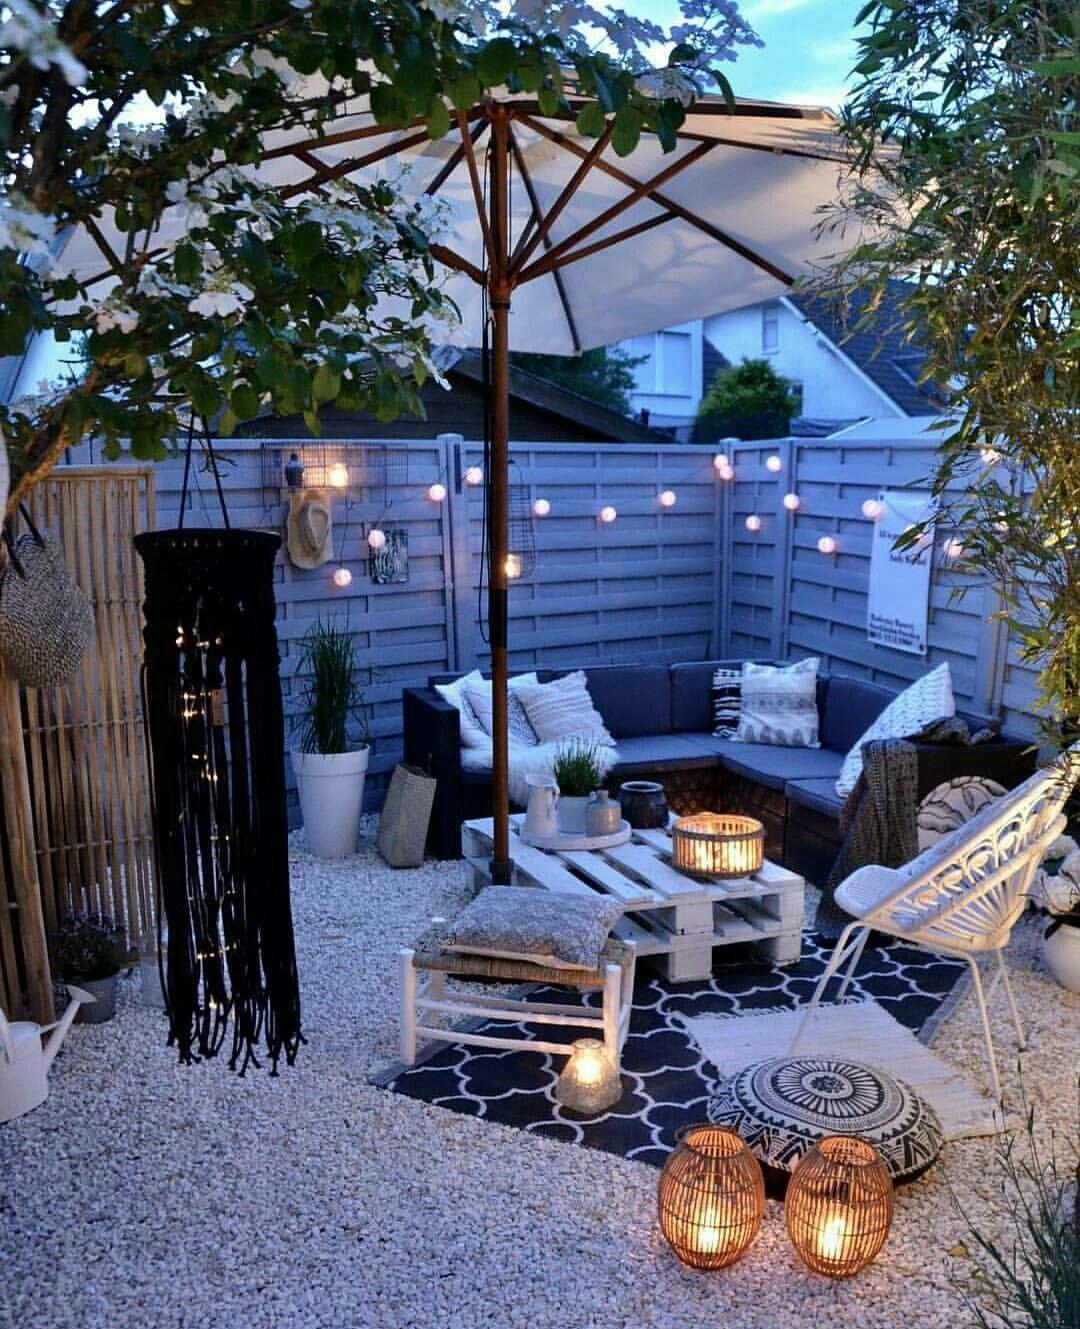 Palette; jardin; exterieur; salon de jardin | In the night garden ...